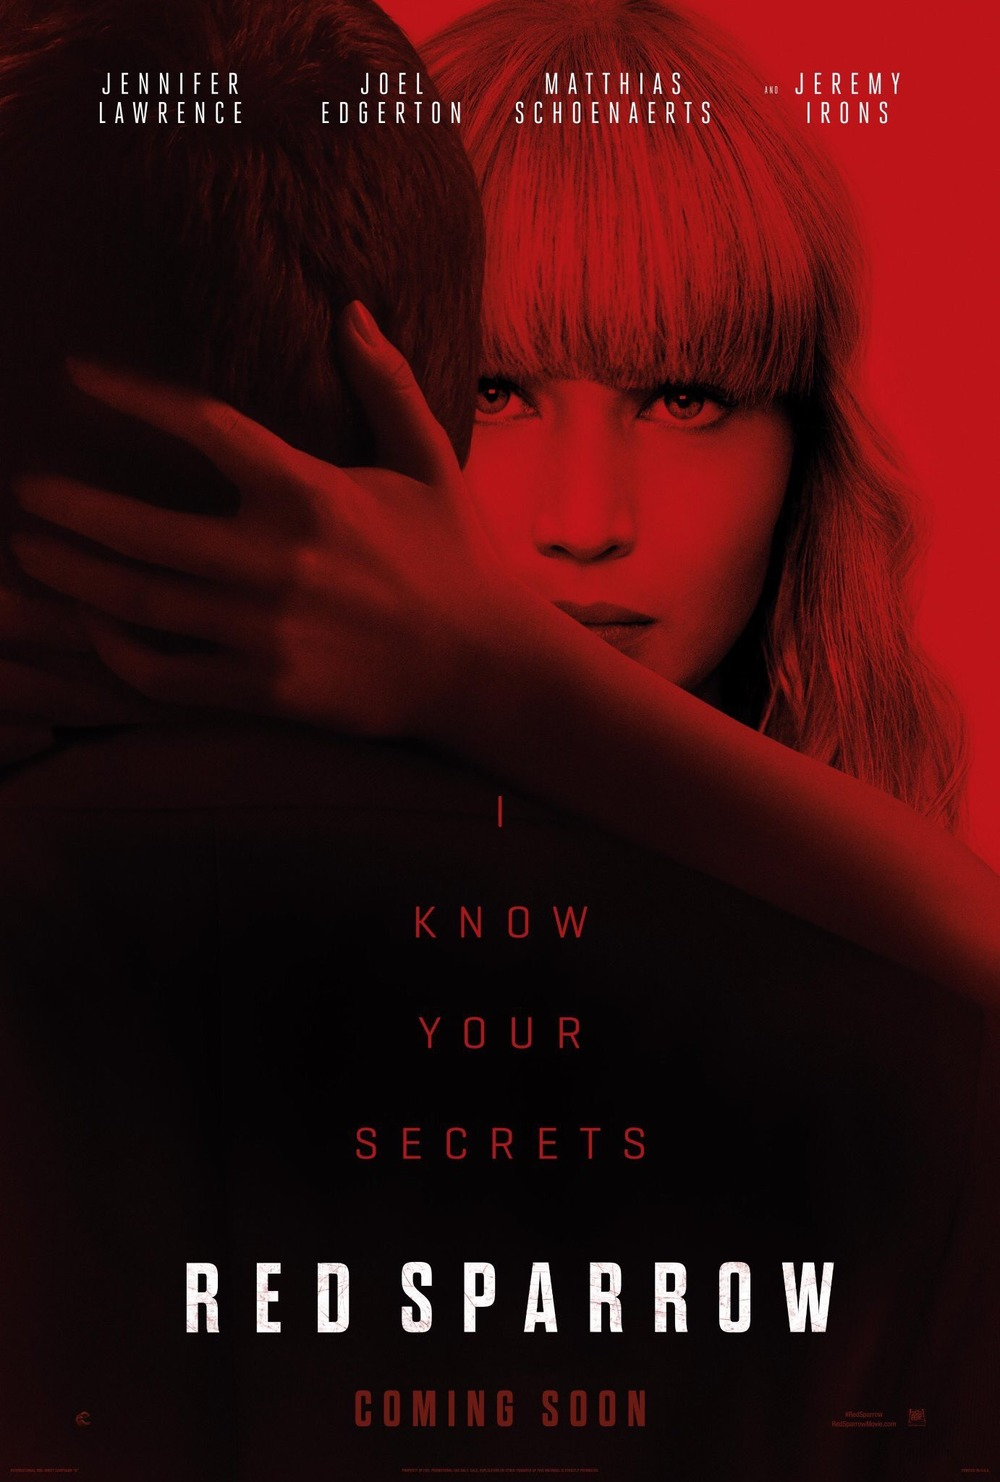 Red Sparrow DVD Release Date | Redbox, Netflix, iTunes, Amazon